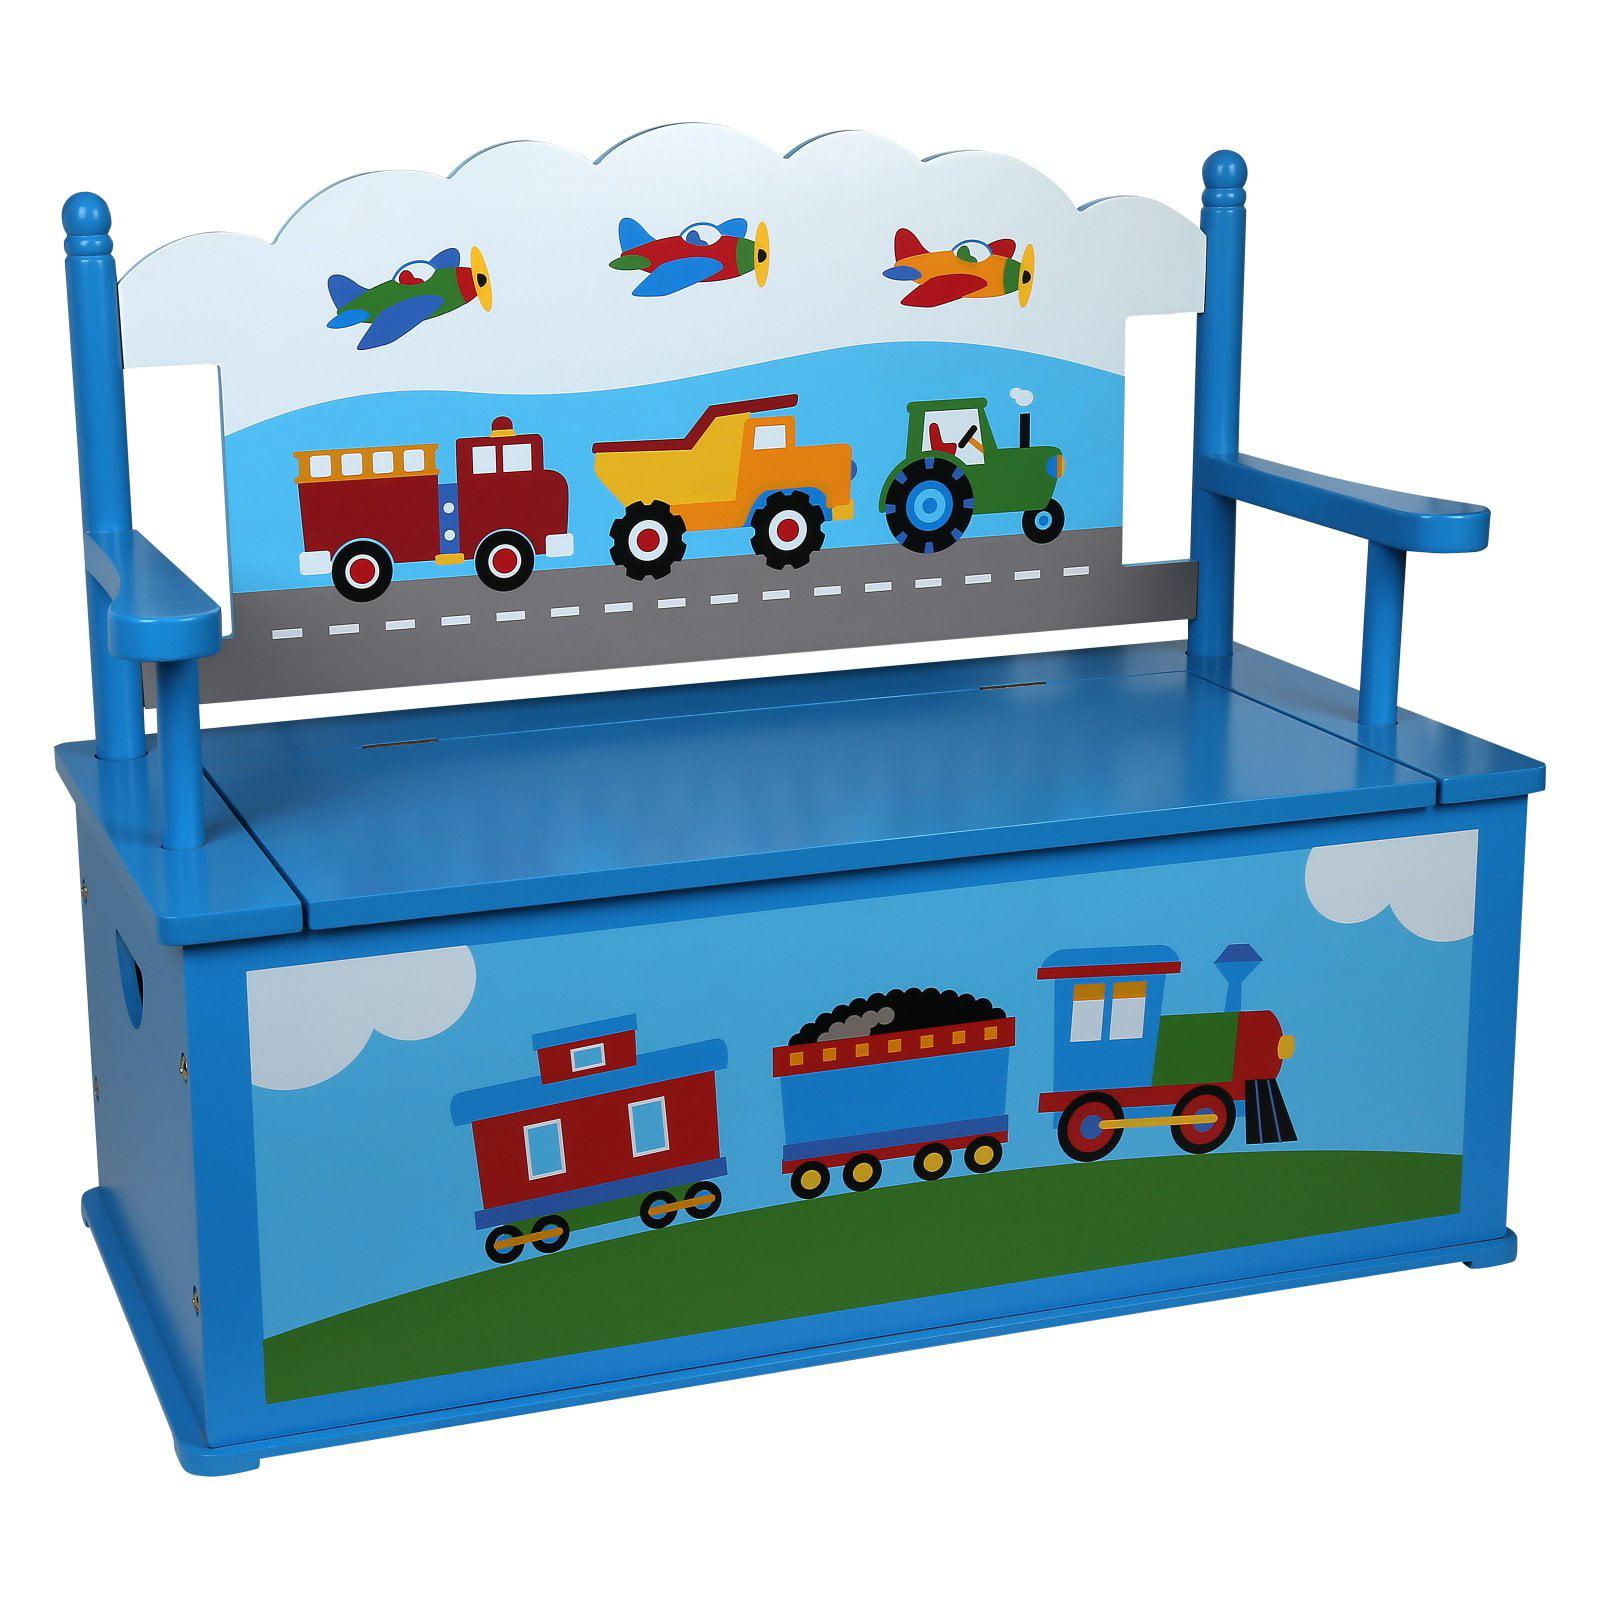 Olive Kids Trains, Planes, Trucks Bench Seat with Storage